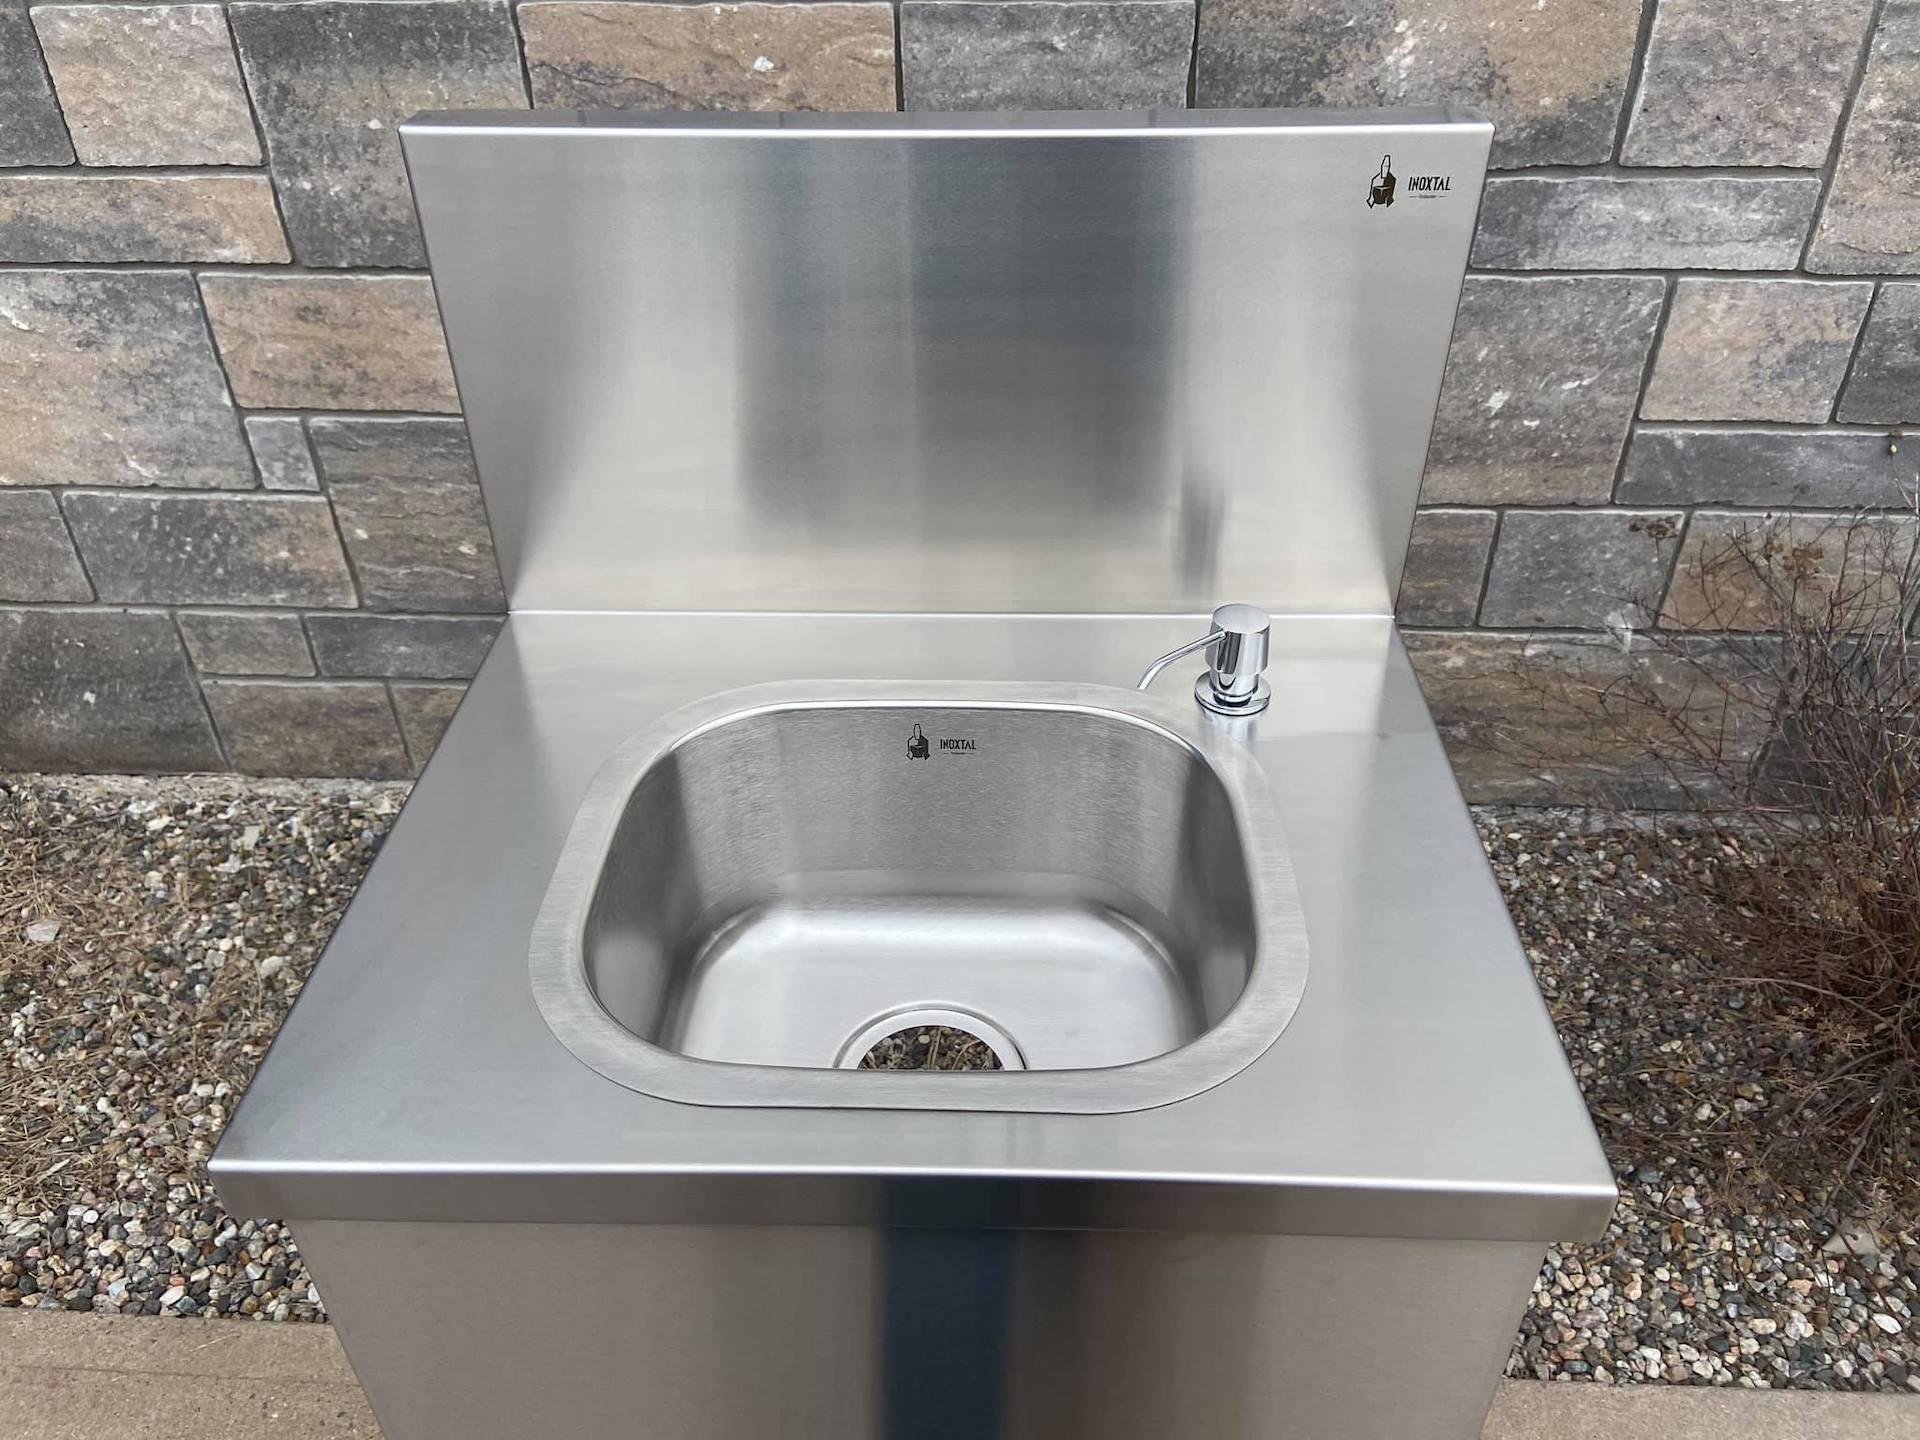 Inoxtal hand washing station 05